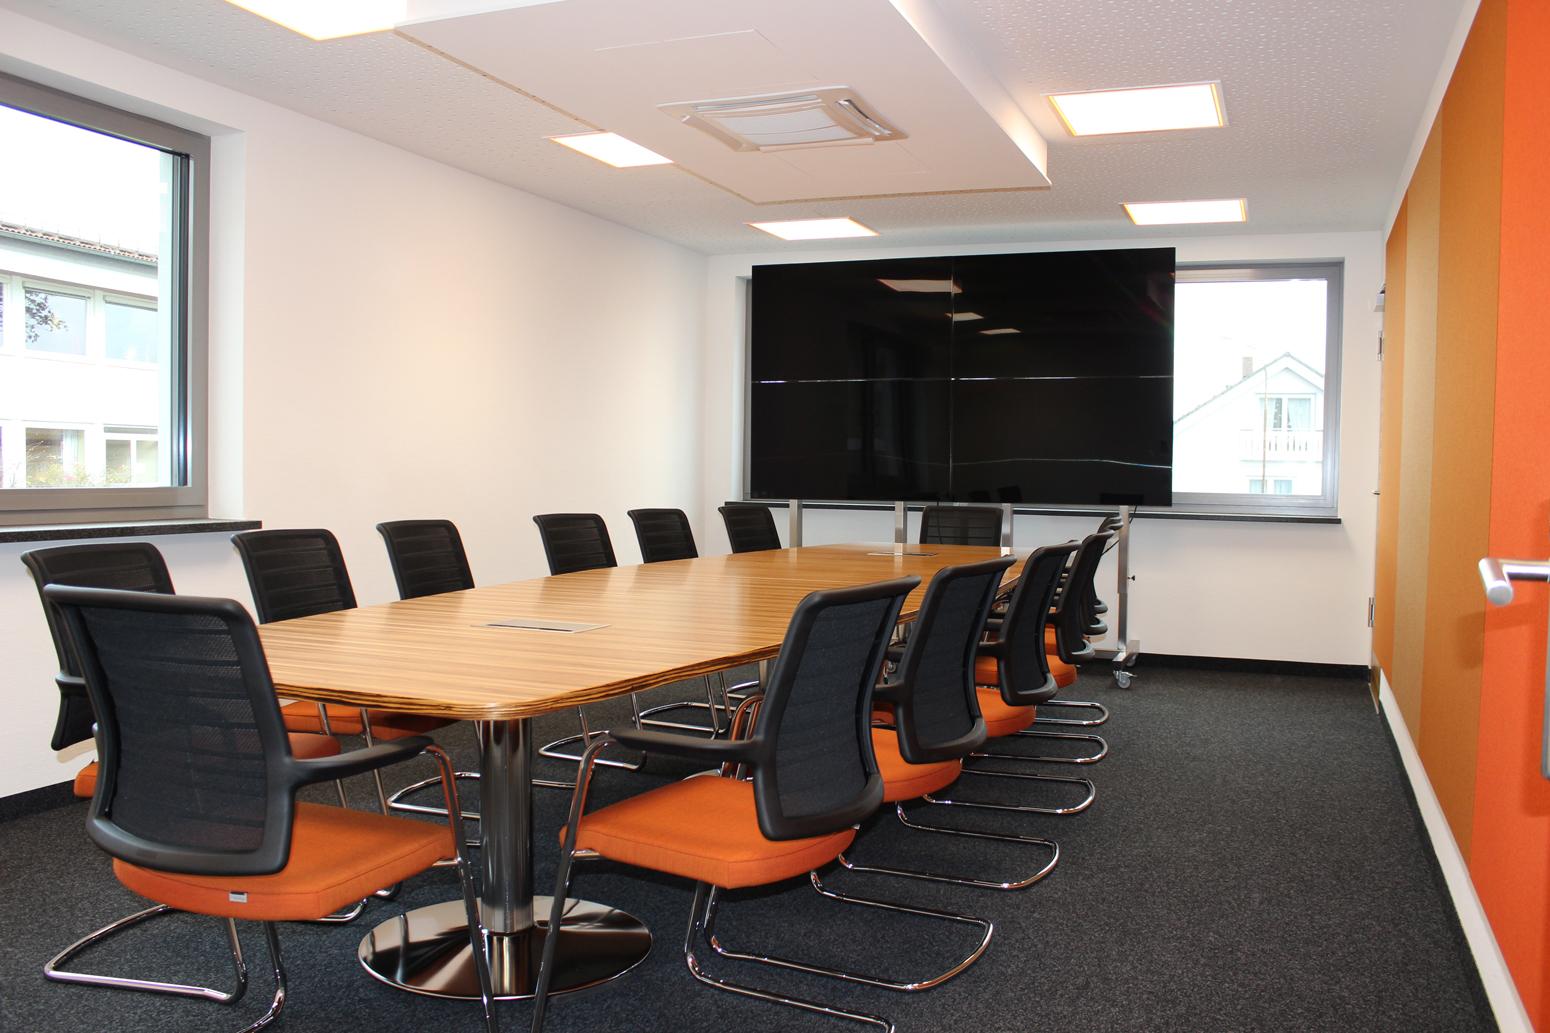 Blick in den Konferenzraum.